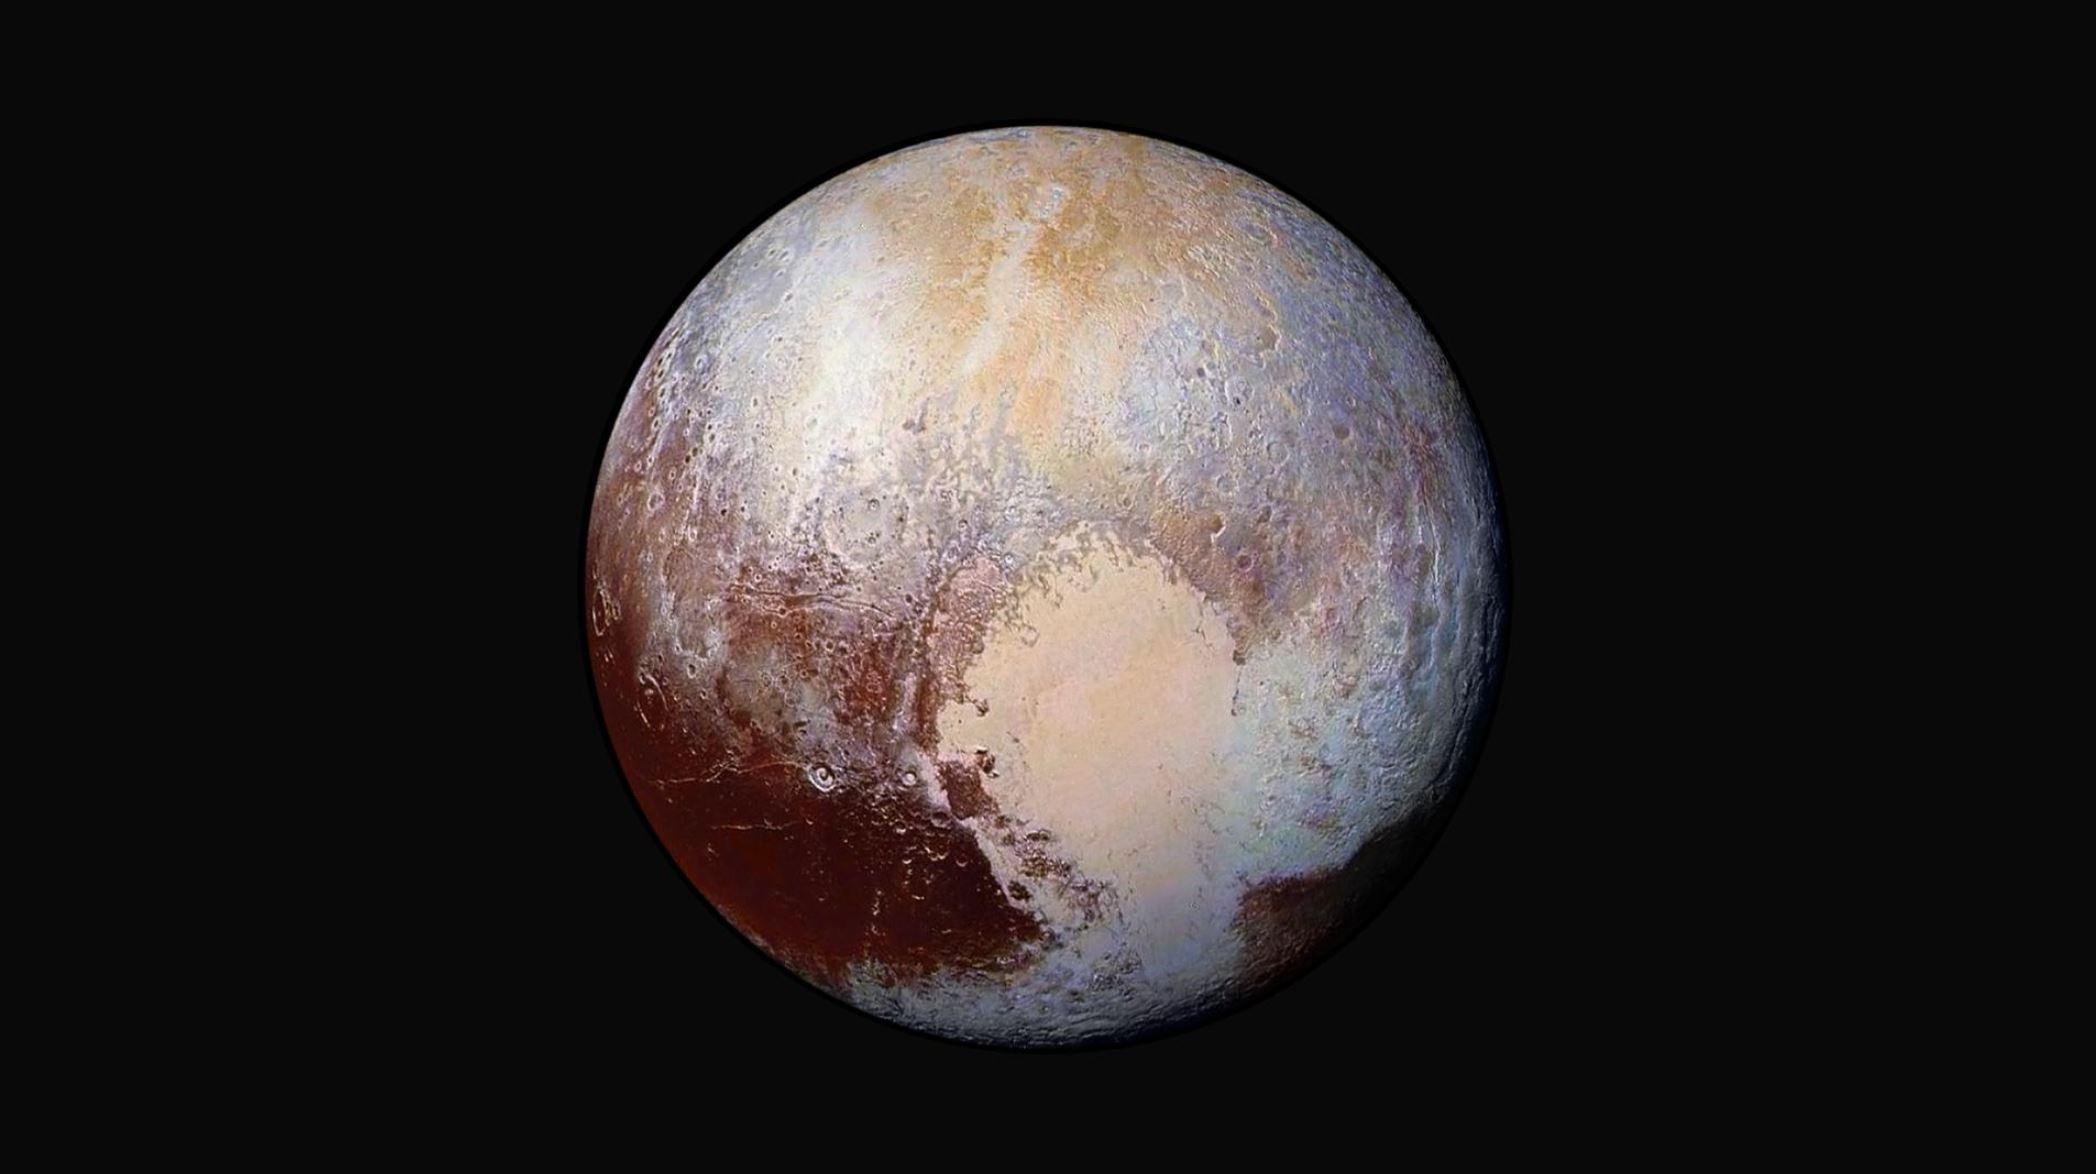 Just stunning! - Image credit: NASA/Johns Hopkins University Applied Physics Laboratory/Southwest Research Institute